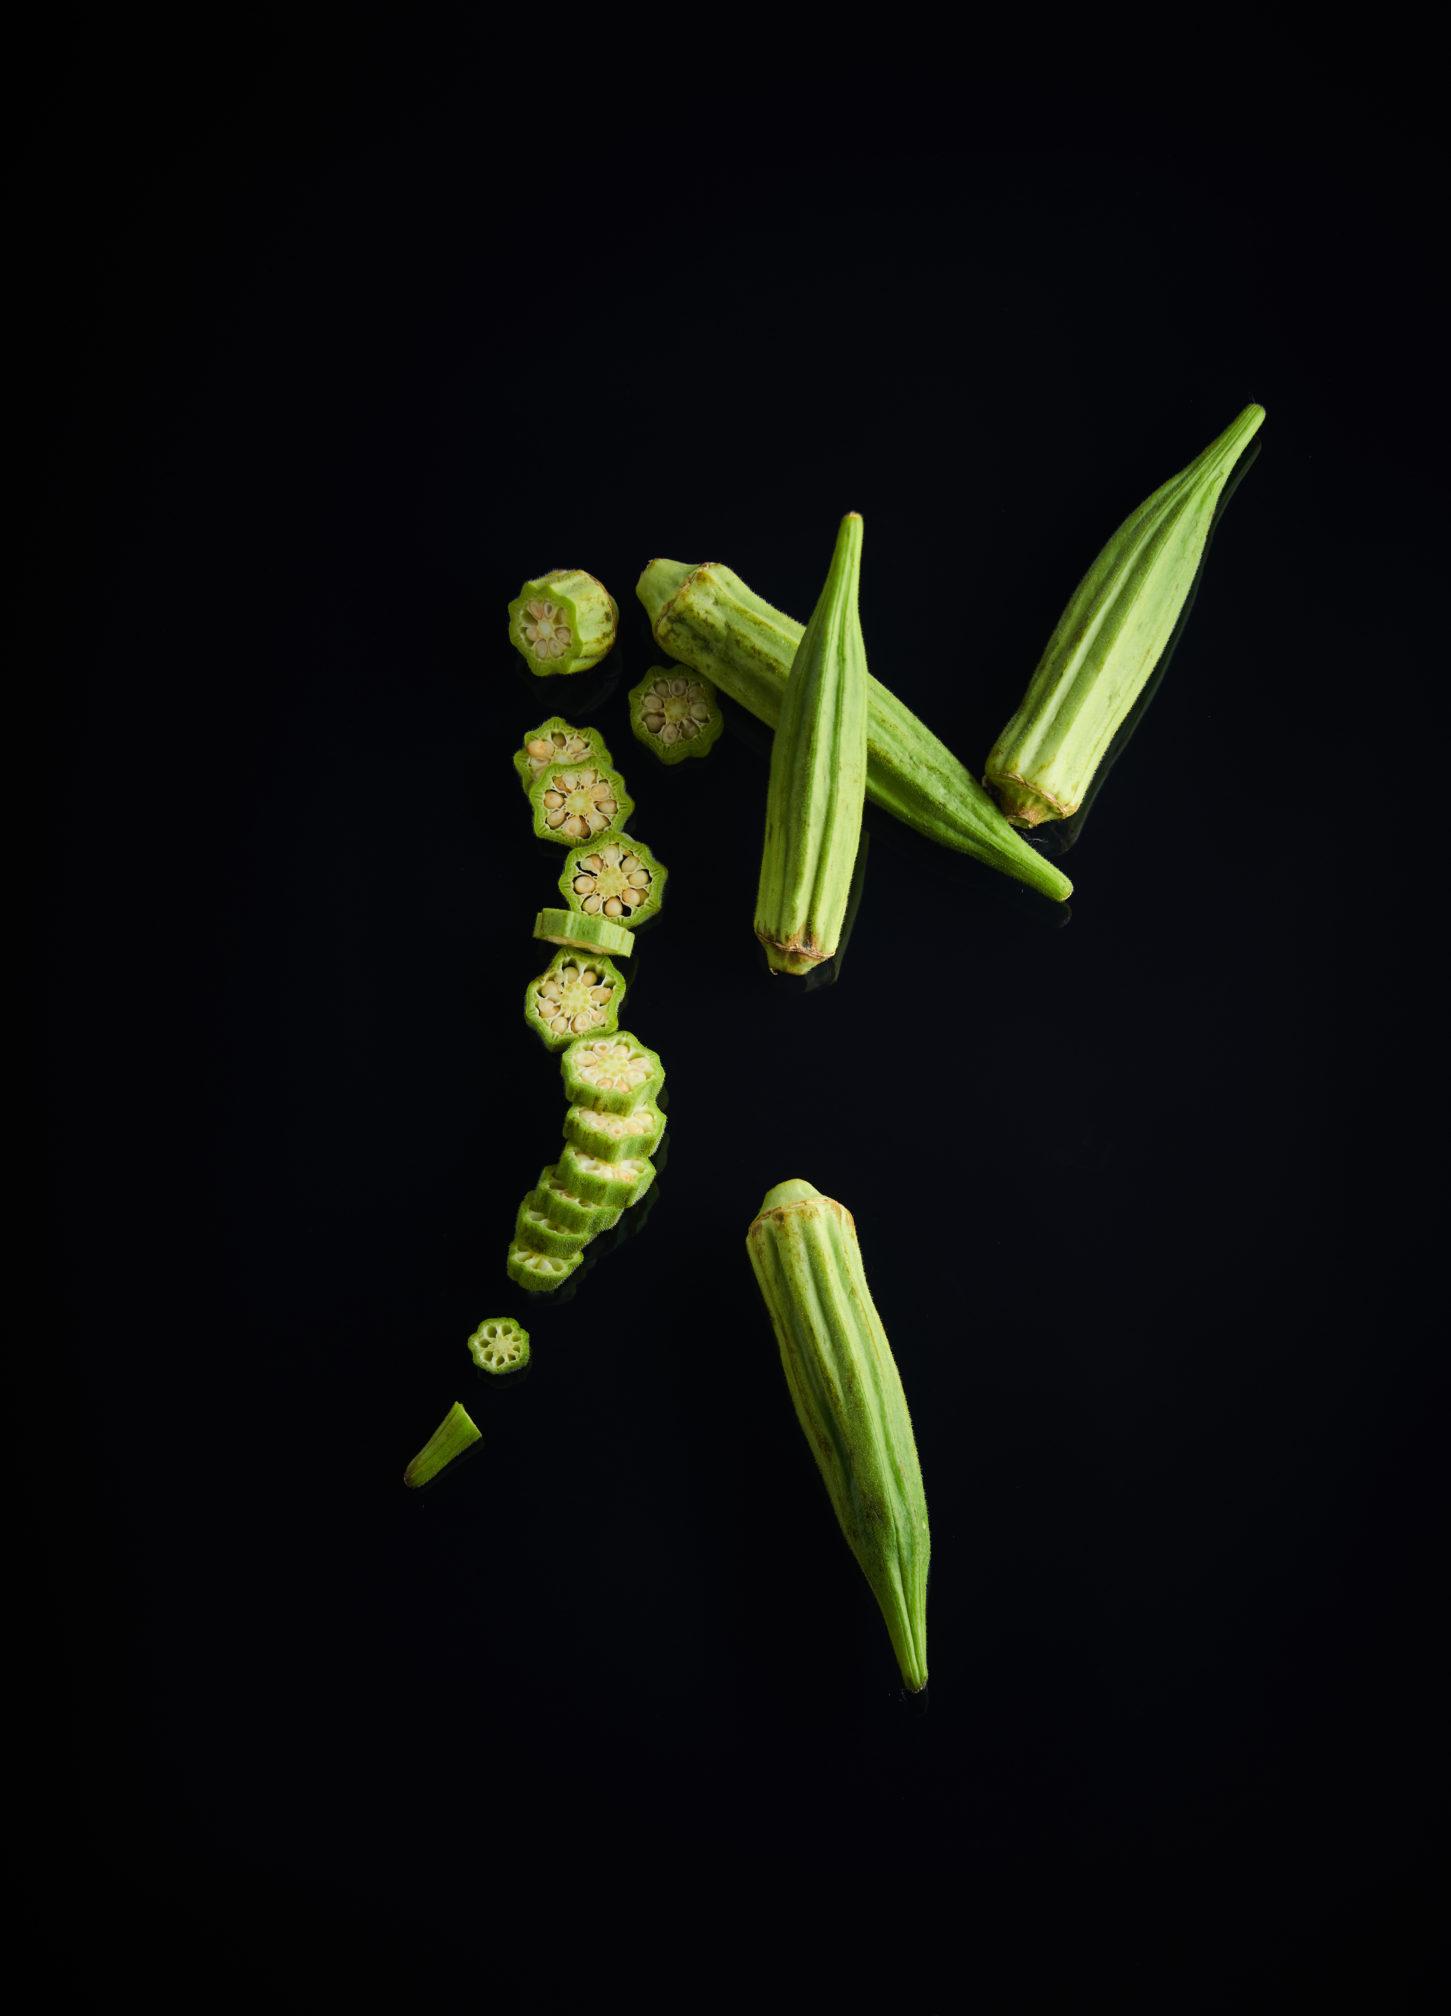 capexo-lilot-fruits-exotique-gombo-nicaragua-honduras-usa-jordanie